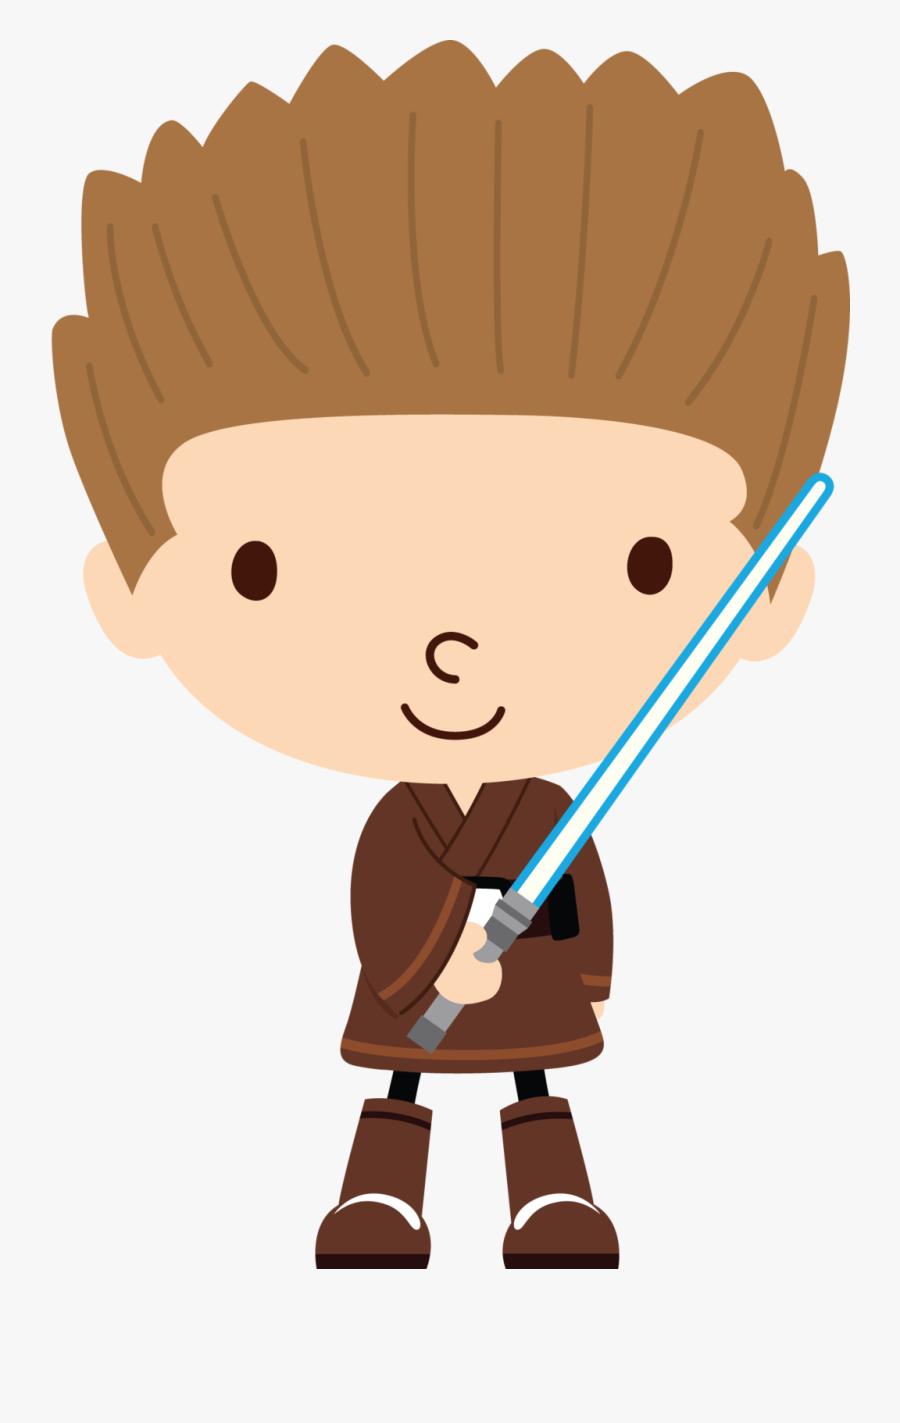 Star Wars Anakin Clipart - Star Wars Clipart Cute, Transparent Clipart